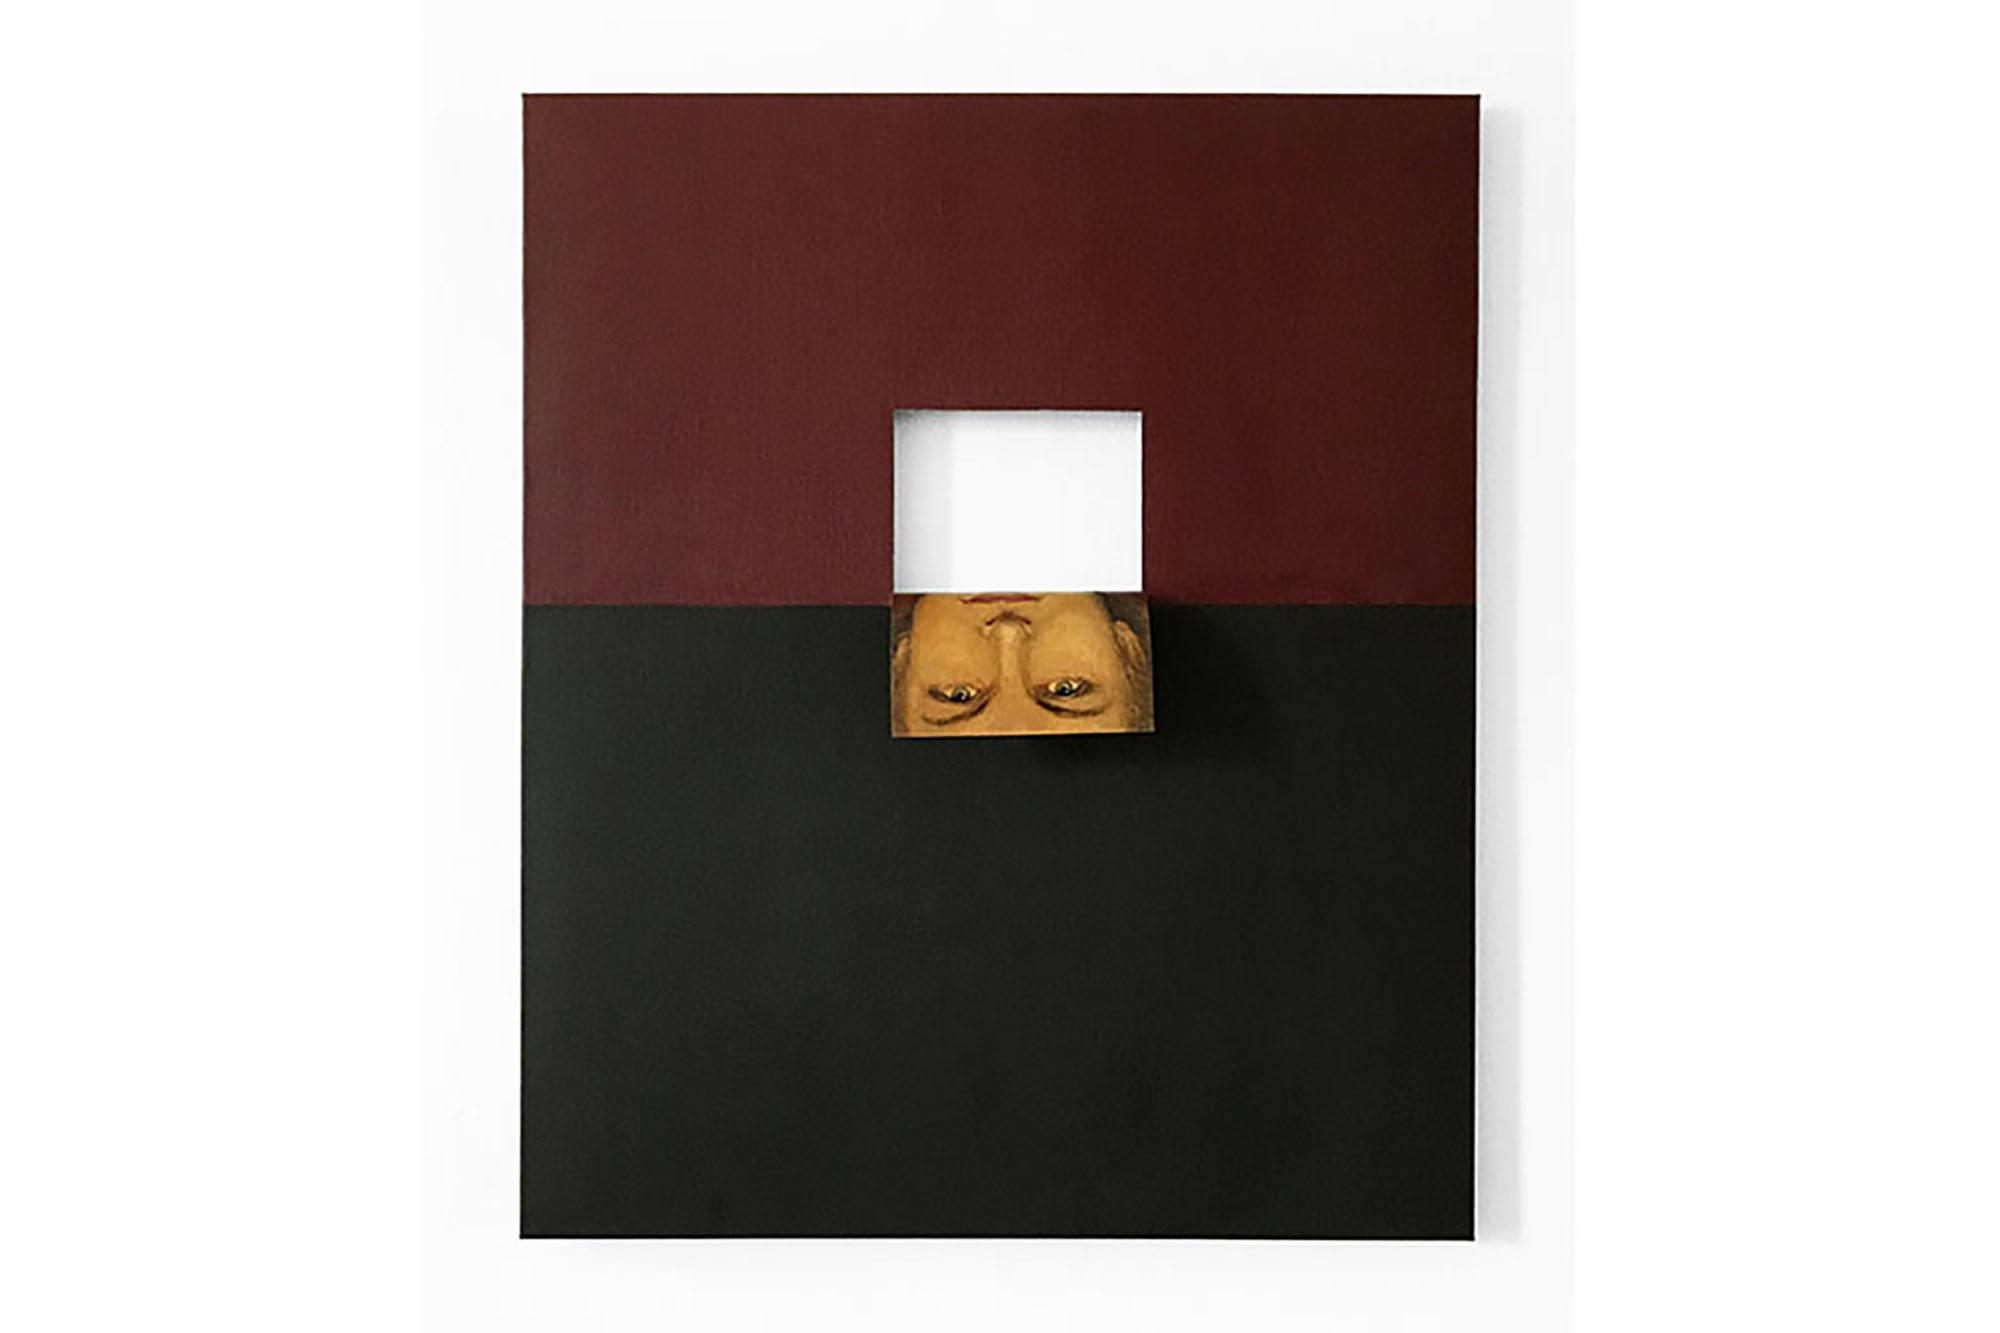 IGNANT-Art-Valeska-Soares-Doubleface-1